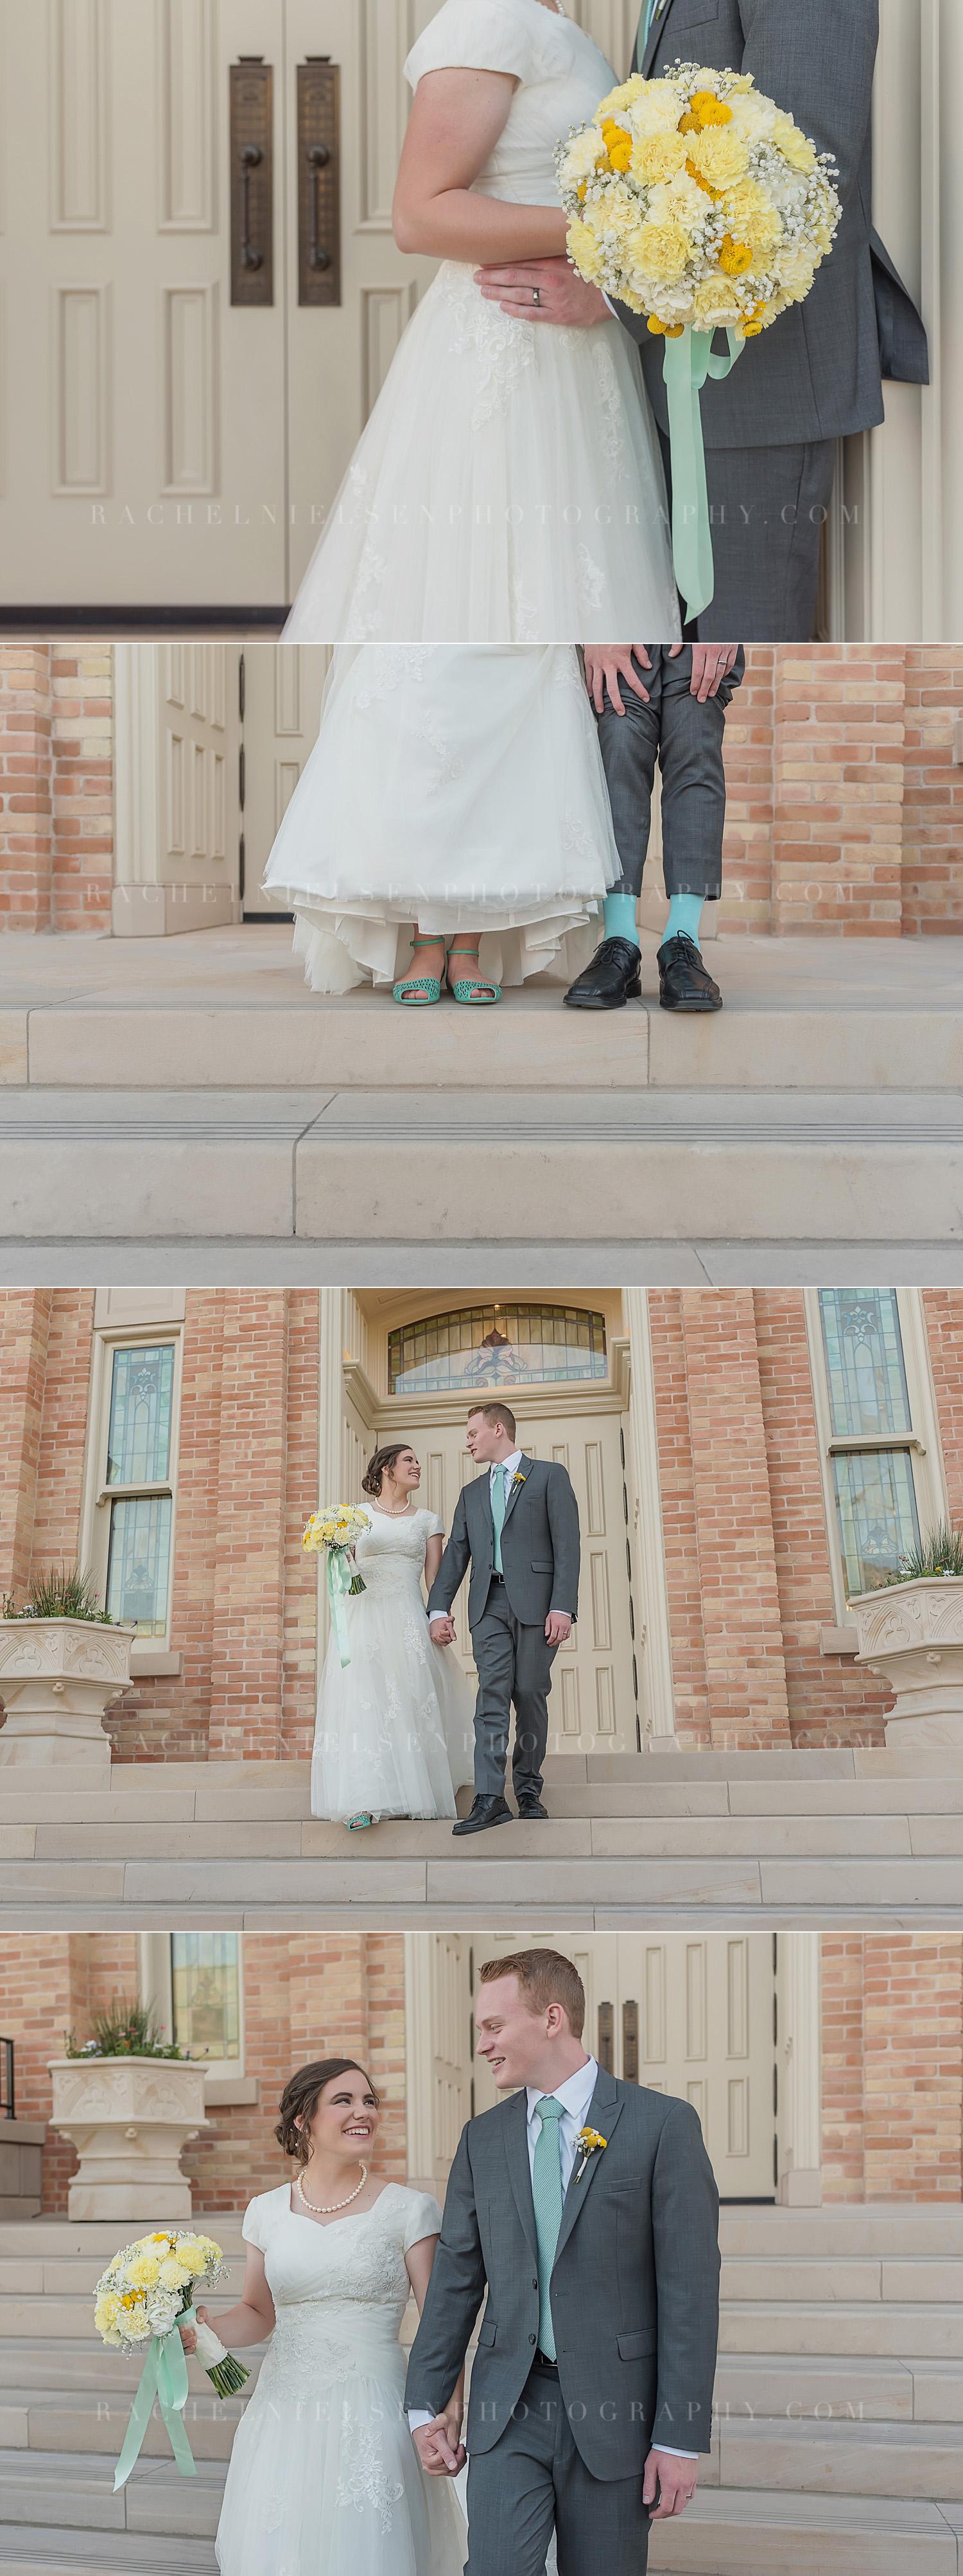 Provo-city-center-temple-wedding-6